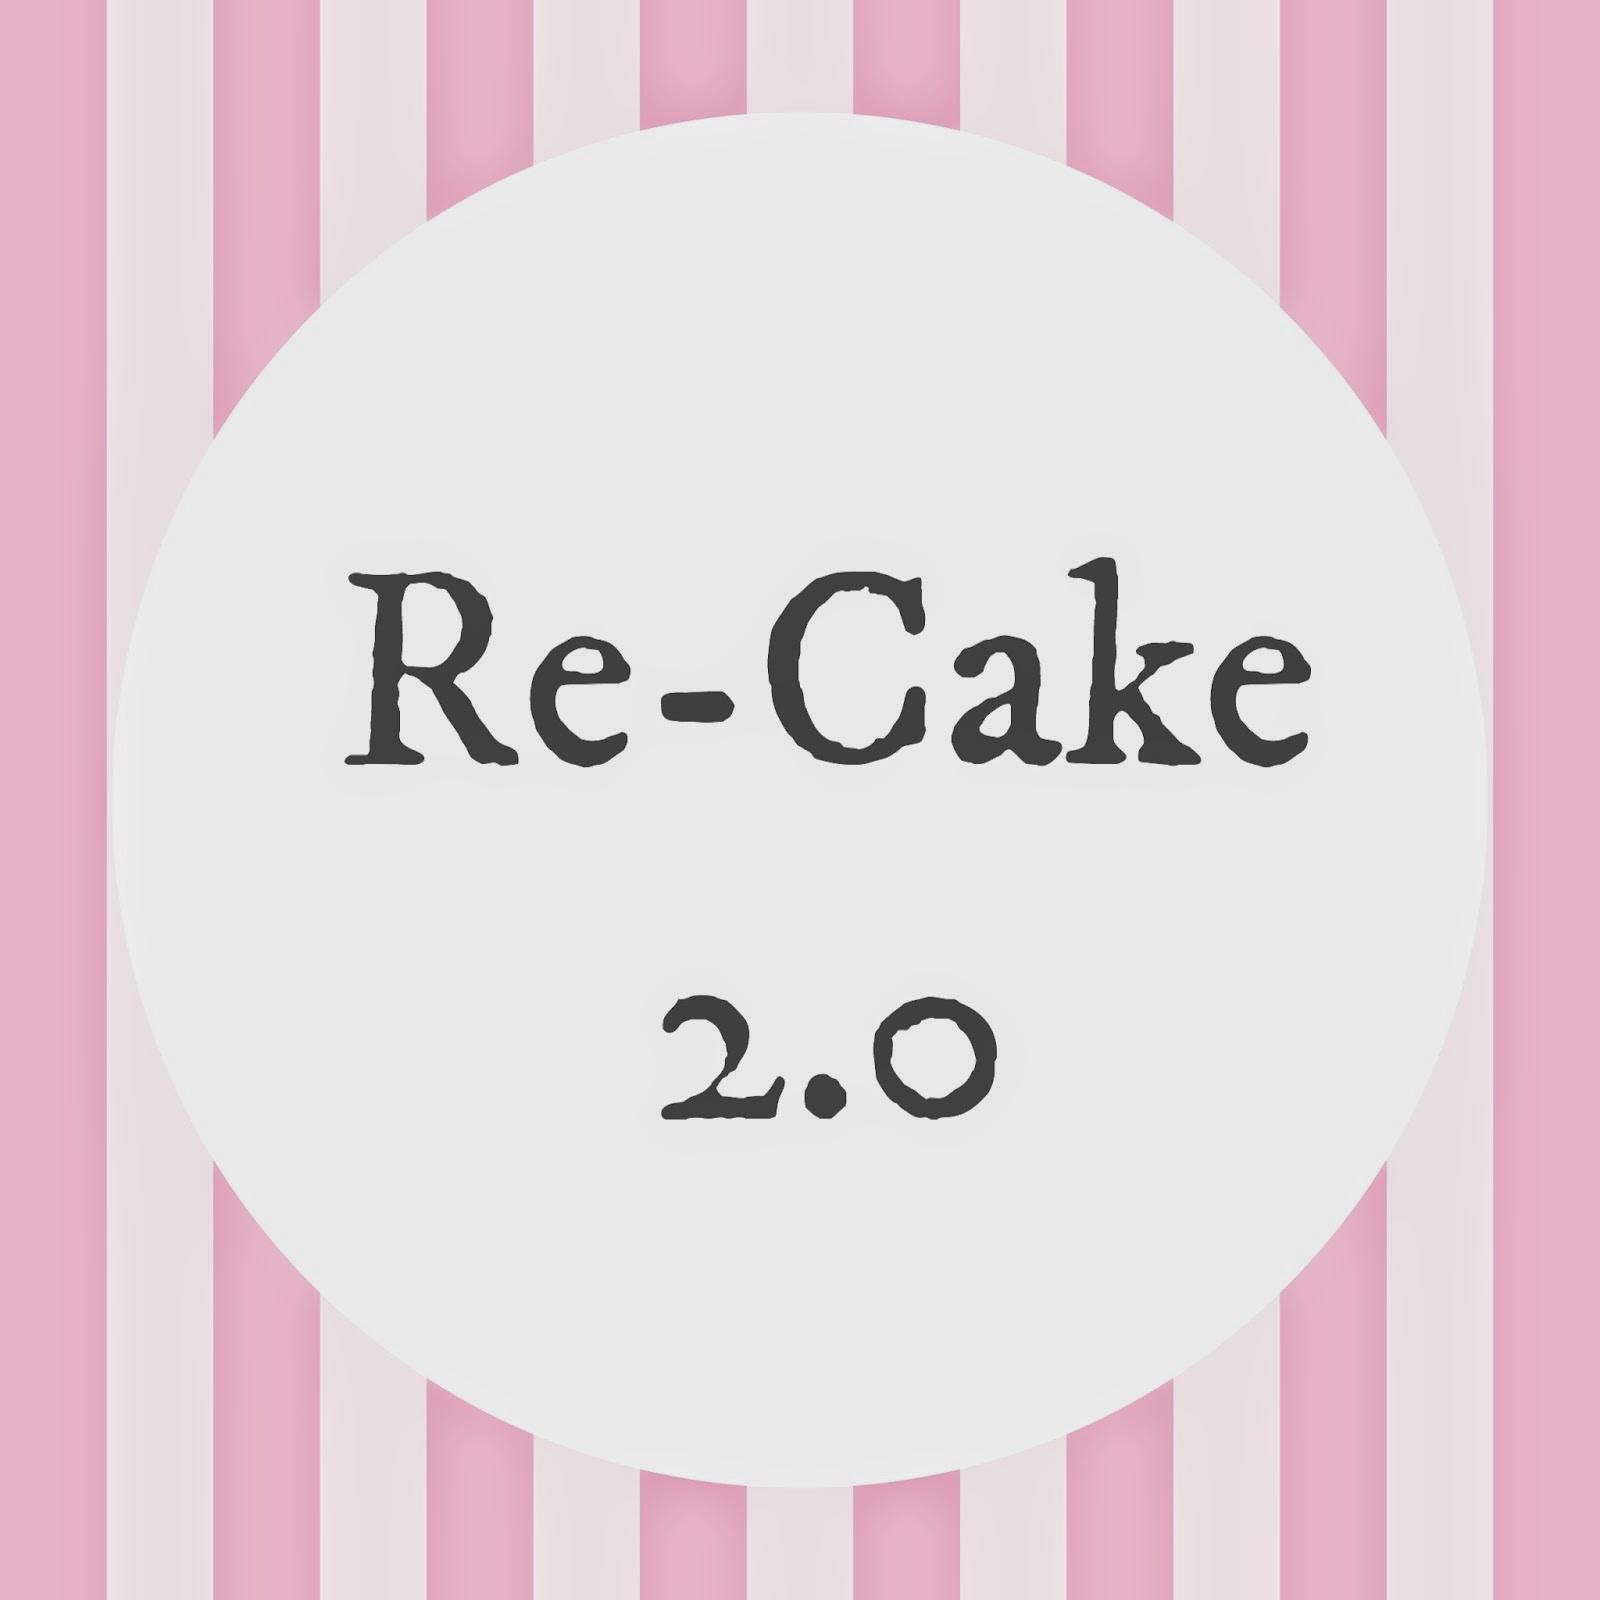 Re-Cake 2.0 su Facebook